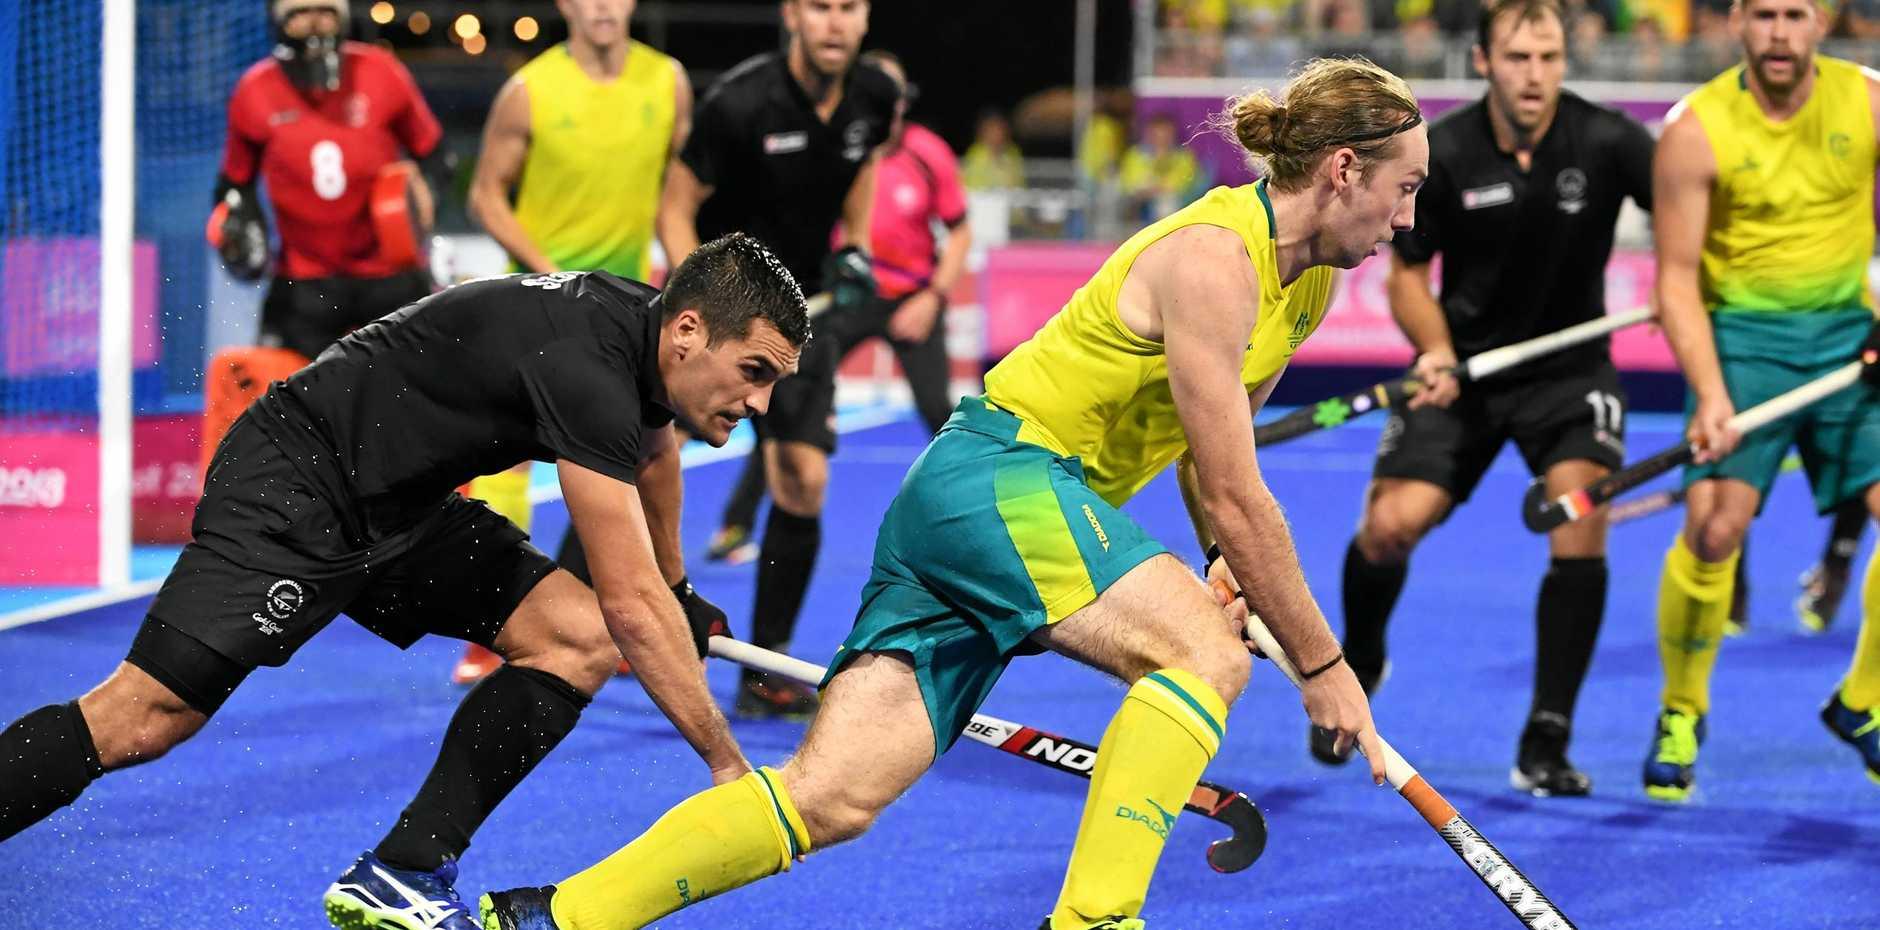 Oceania Cup a coup for Rocky: Hockey Australia boss | Morning Bulletin